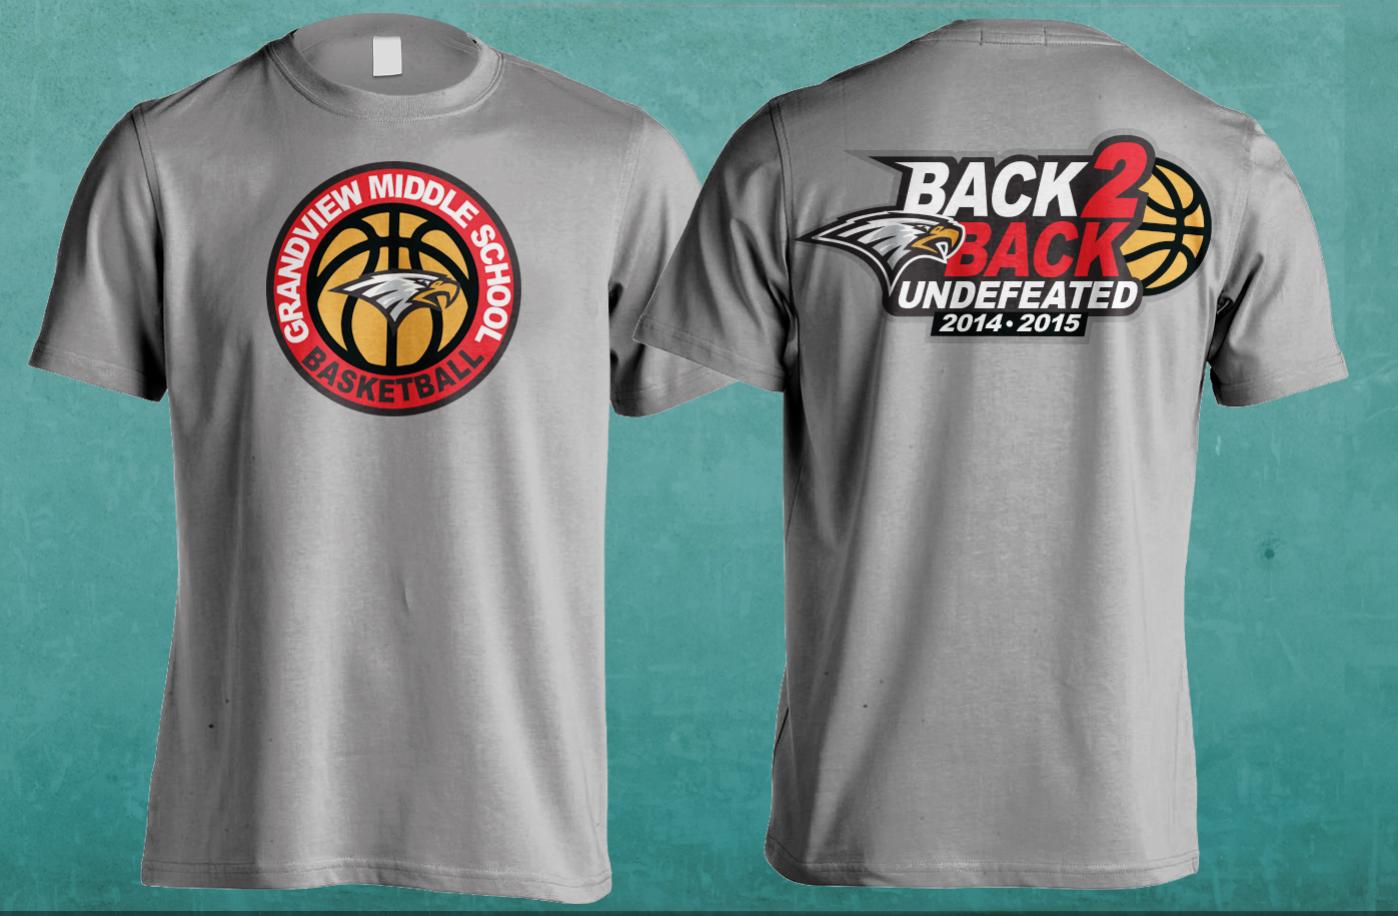 Shirt design concepts - T Shirt Design Concepts For Undefeated Season Champions